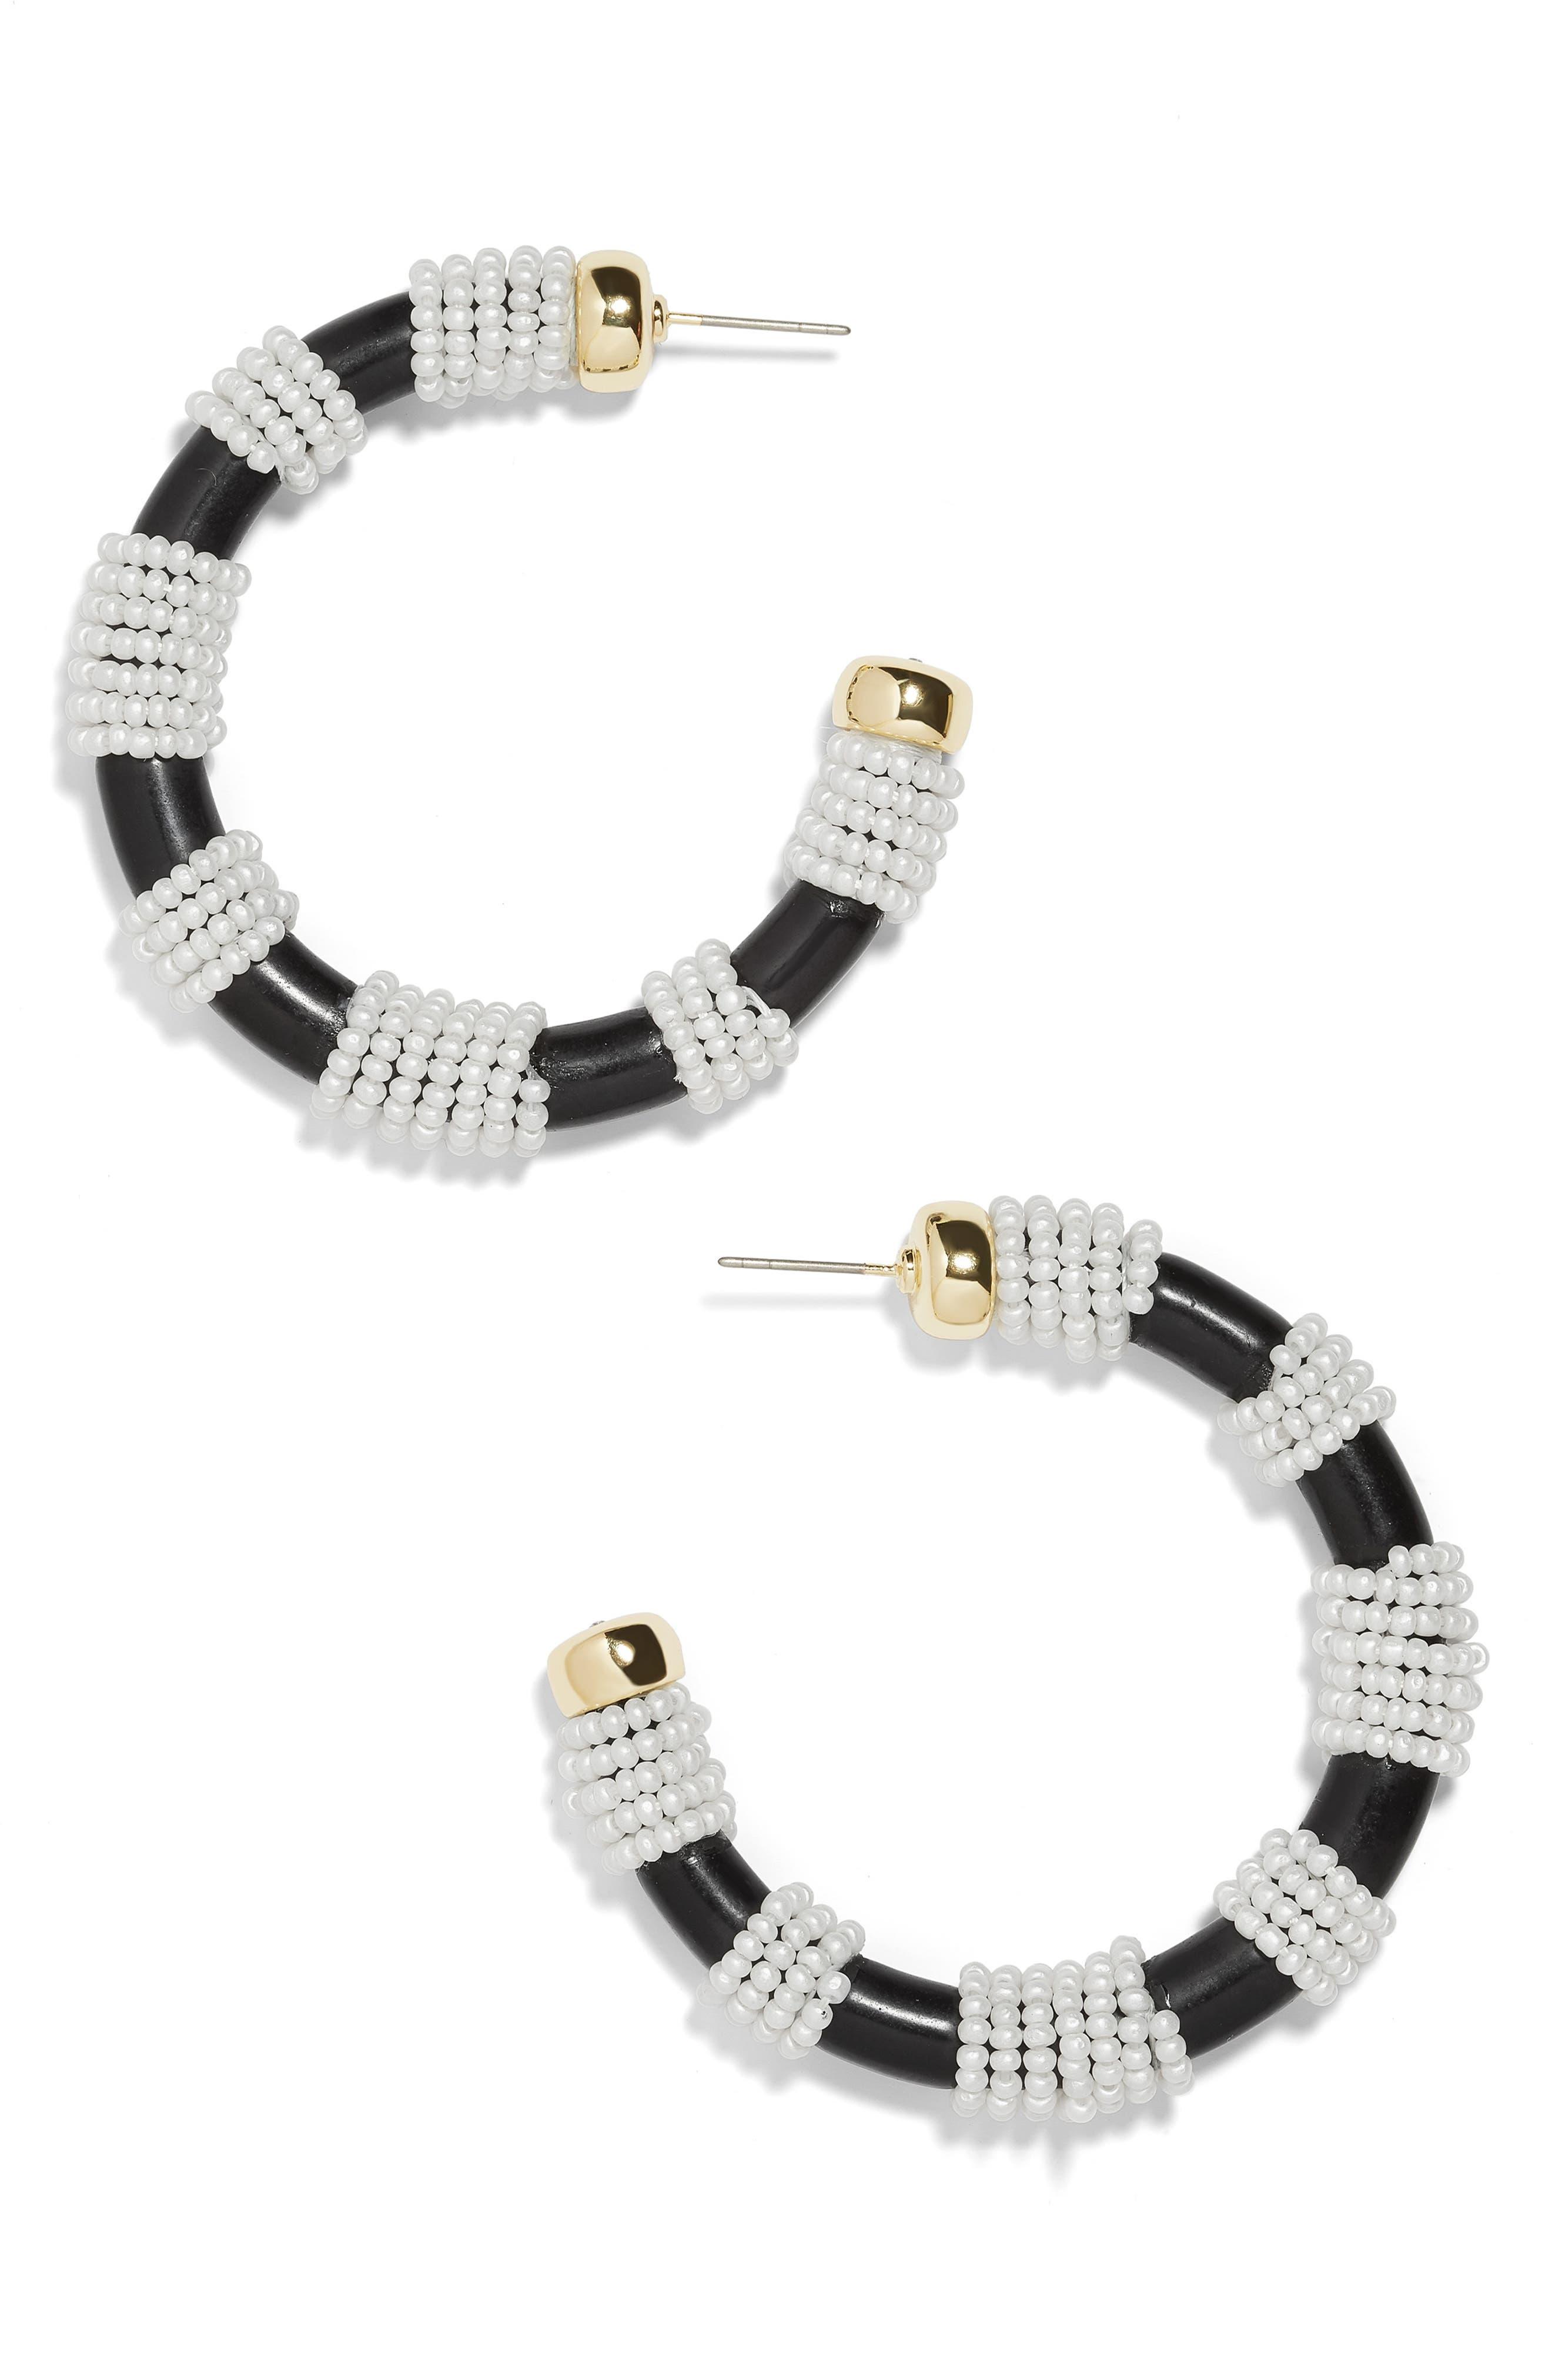 BAUBLEBAR, Beaded Hoop Earrings, Main thumbnail 1, color, BLACK/ WHITE